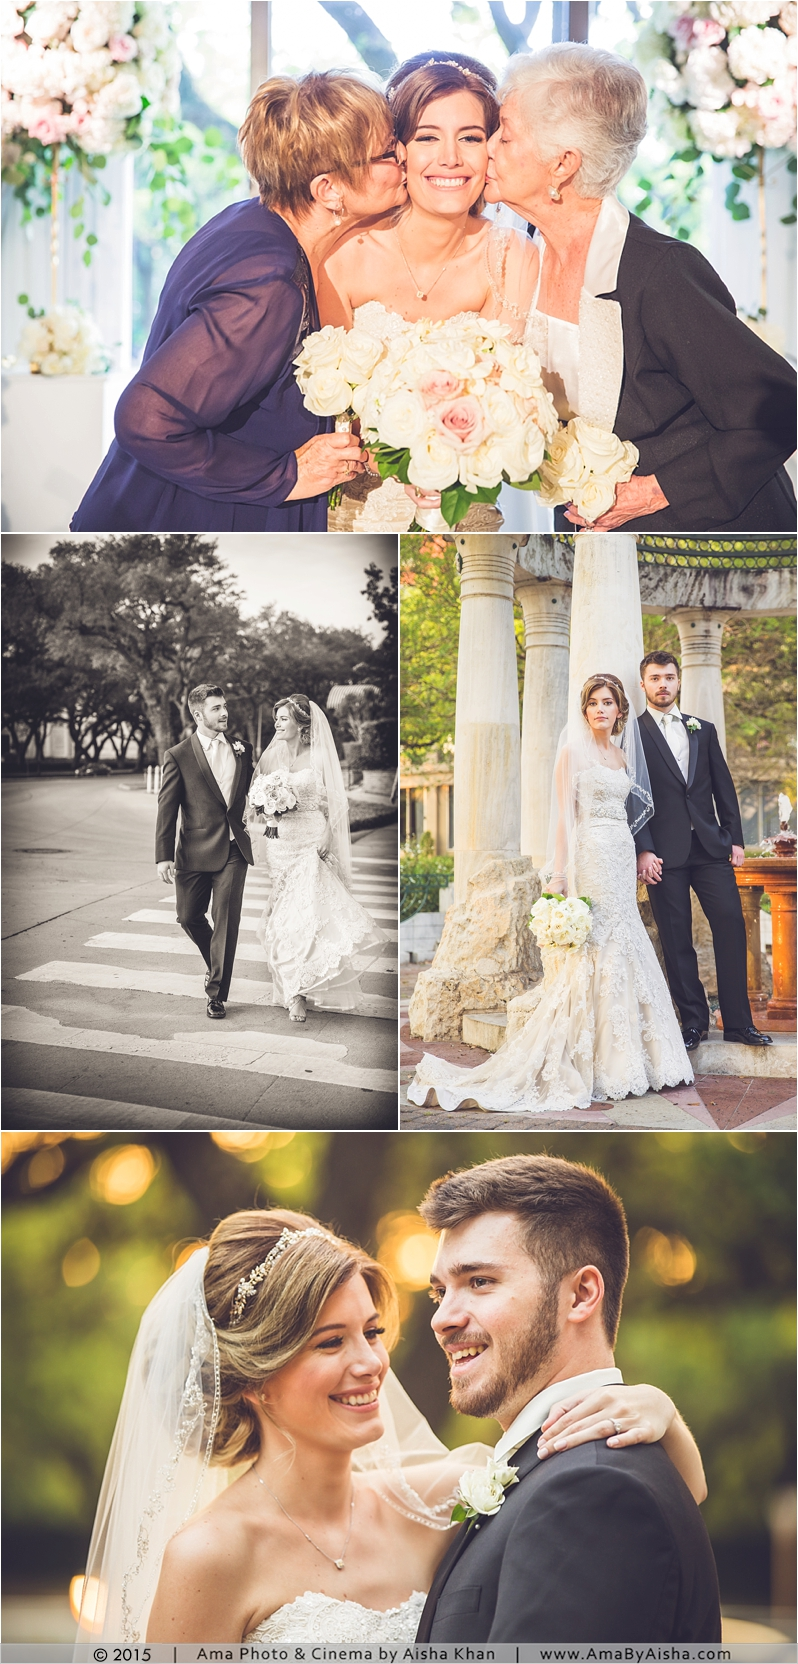 ©2015 | www.AmaByAisha.com | Hotel Zaza Wedding